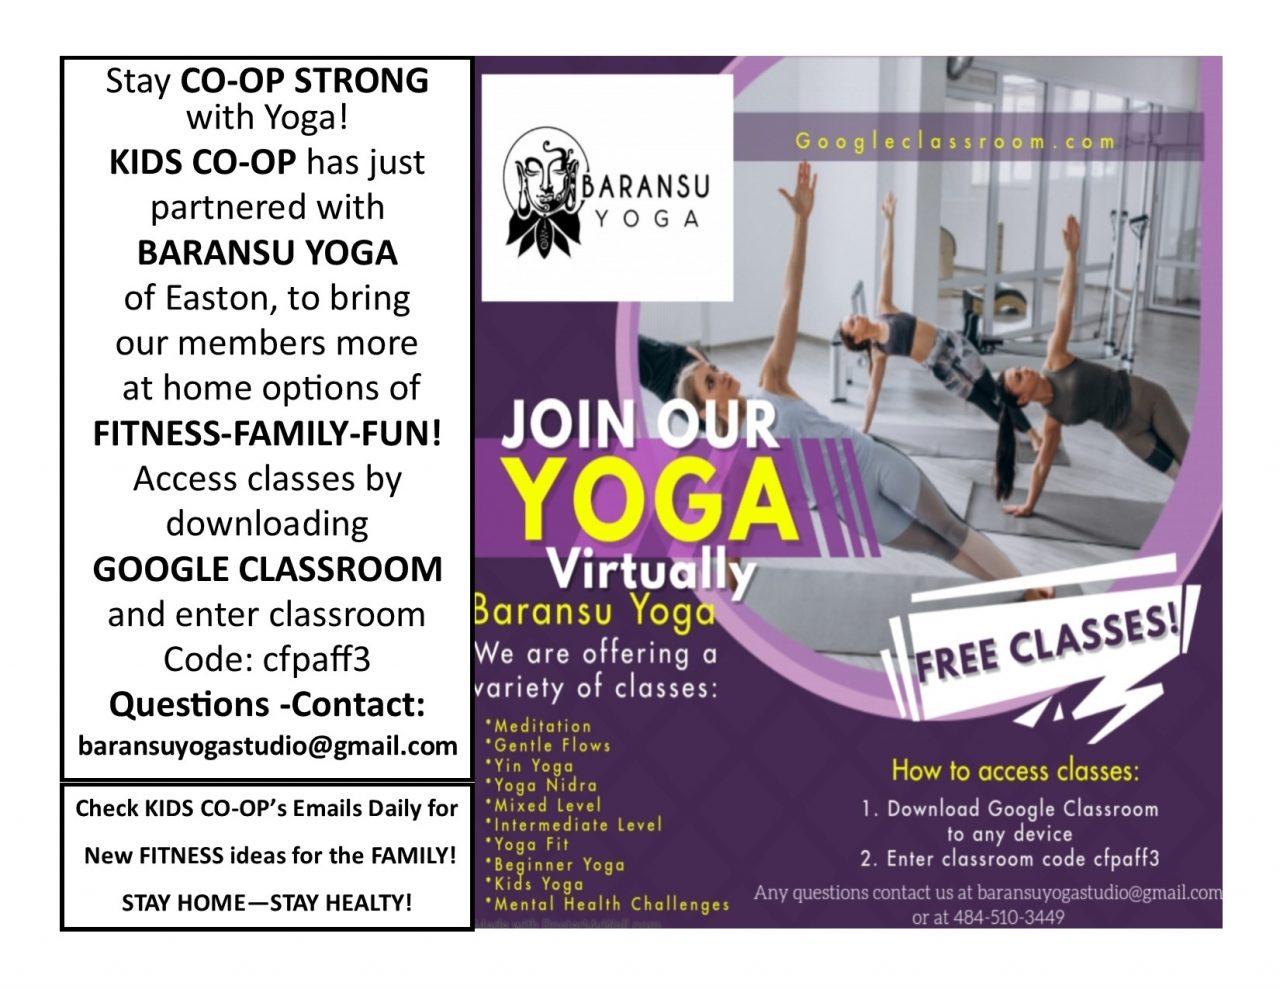 Baransu-Yoga-Class-Link-Info-1280x989.jpg